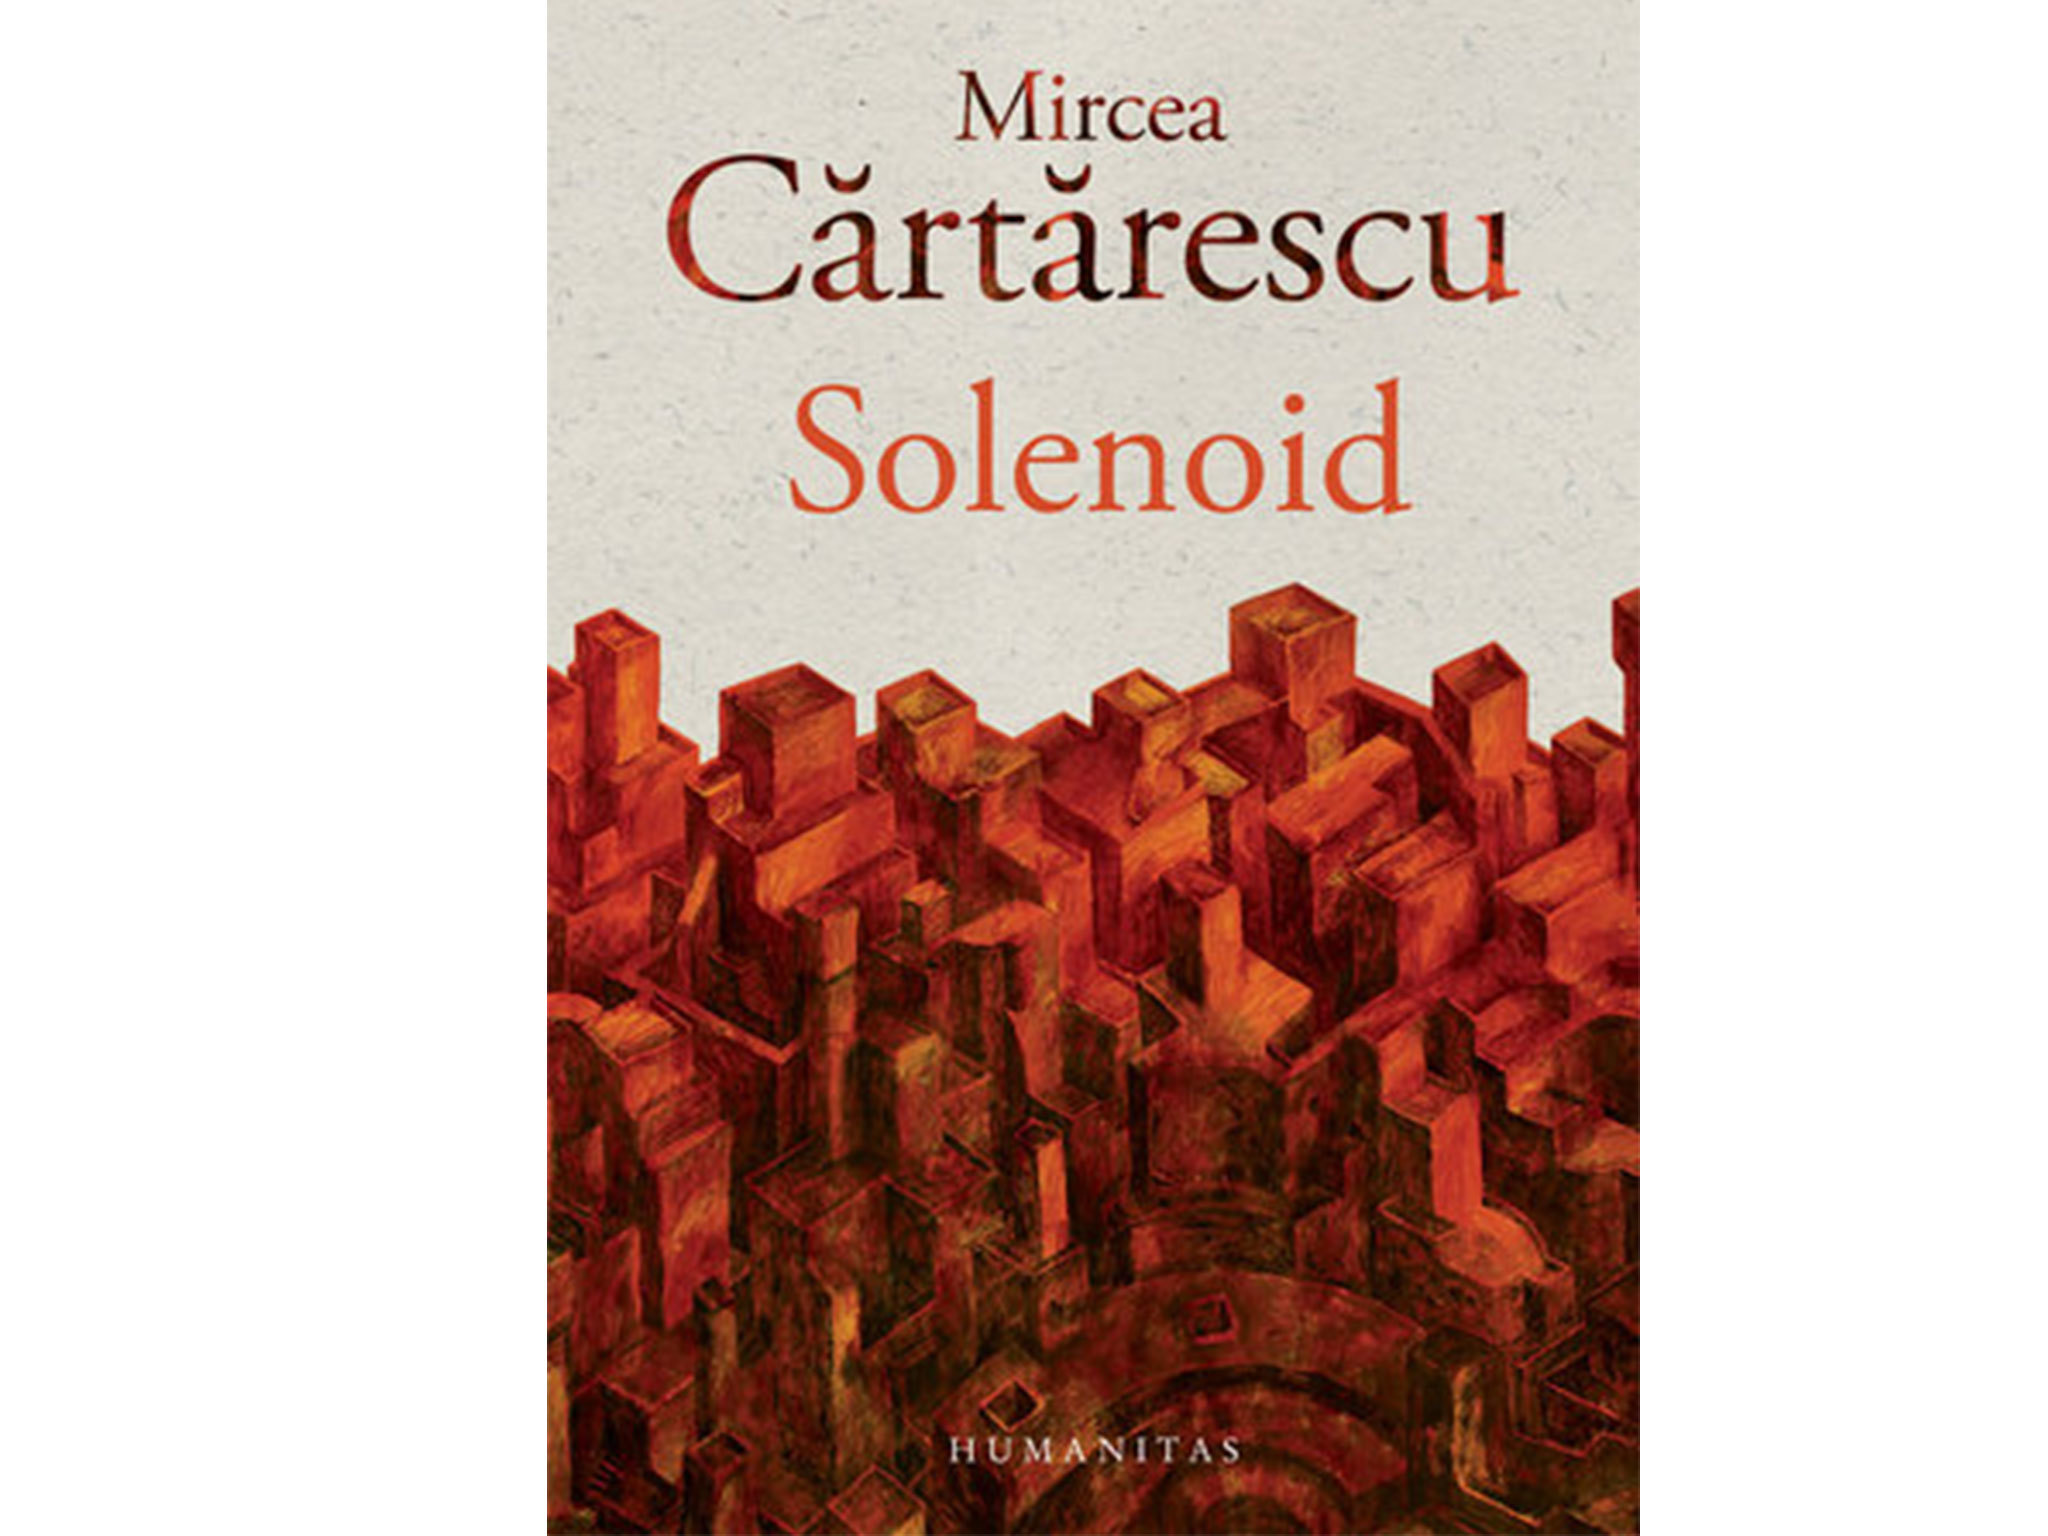 Solenoide, Mircea Cartarescu, traducción de Marian Ochoa de Eribe (Impedimenta, 2017)